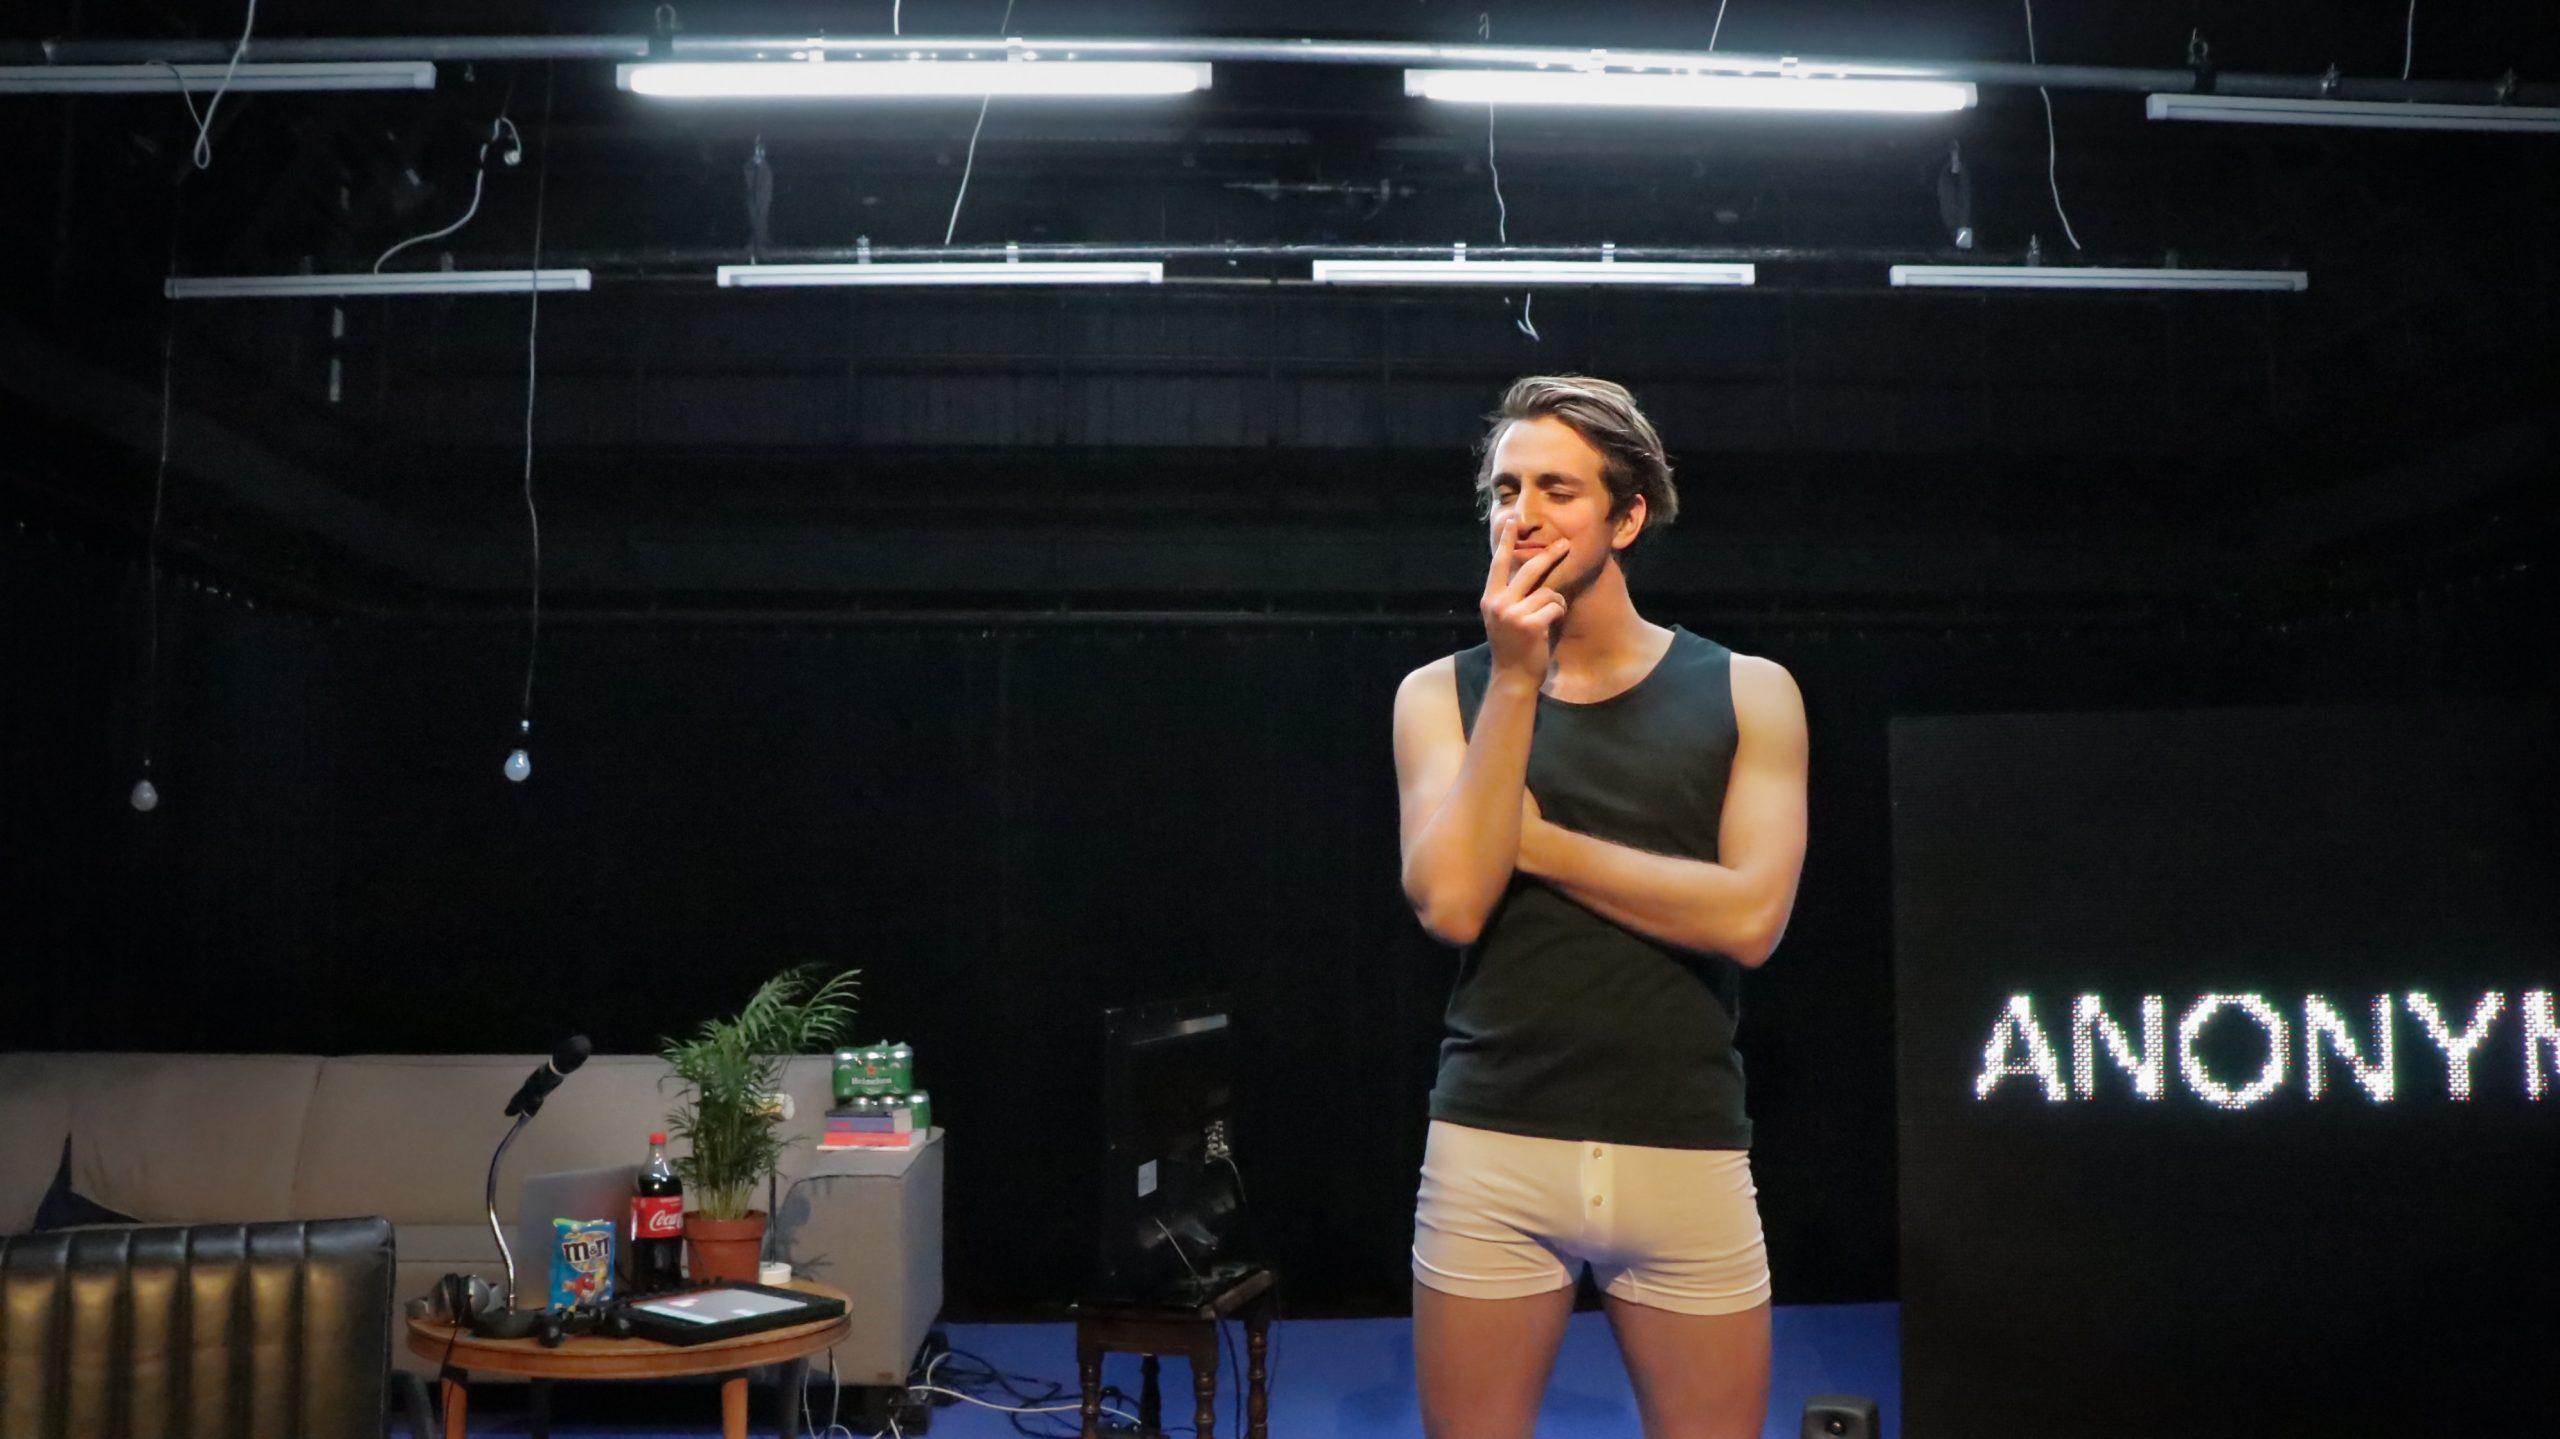 Abe Dijkman - Lurk Moar - Acteur - Frascati Theater - Theater - Charli Chung